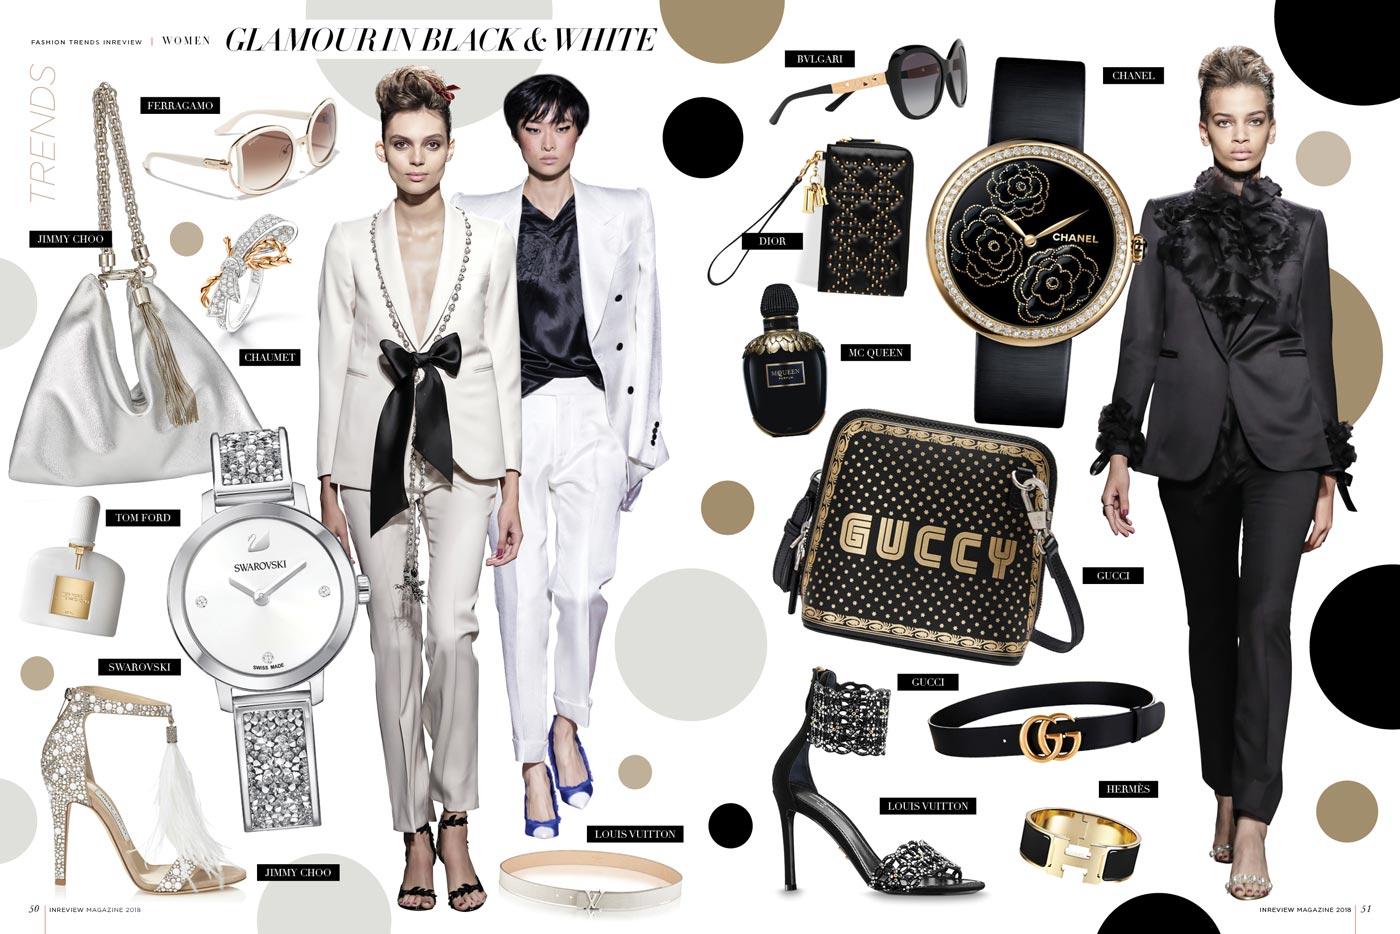 Women Glamour in Black White